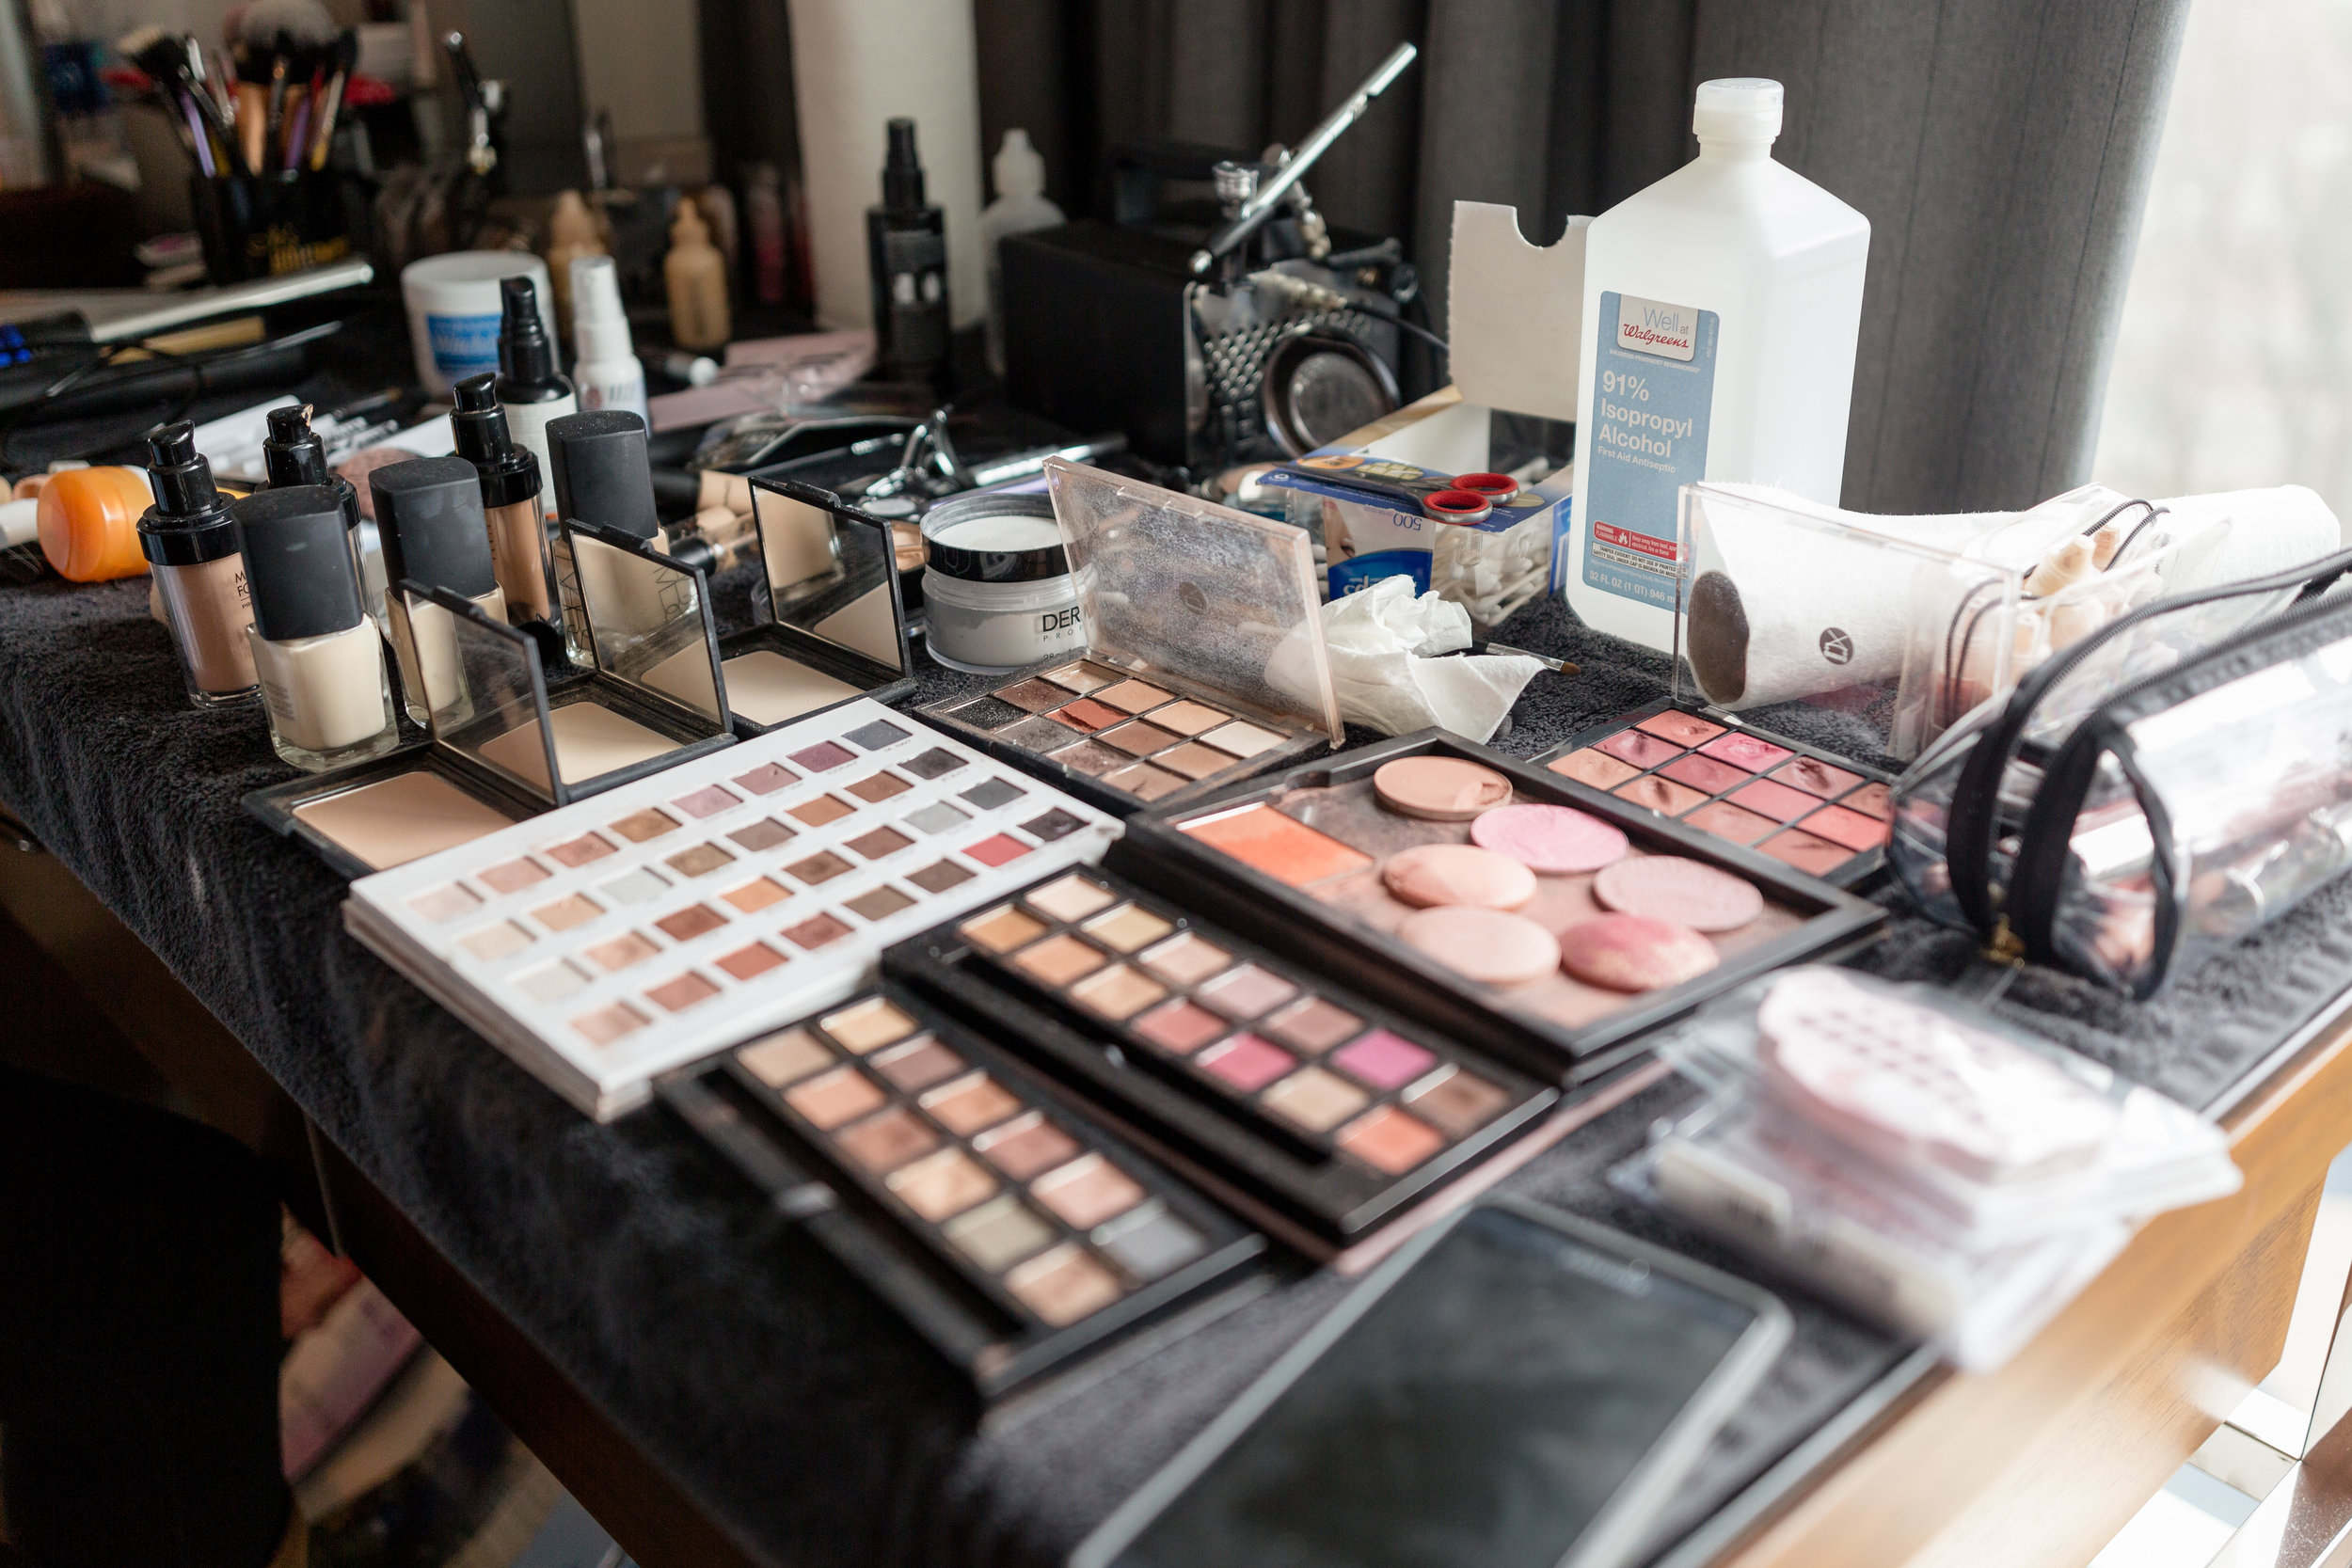 Professional Makeup Artist Set Up